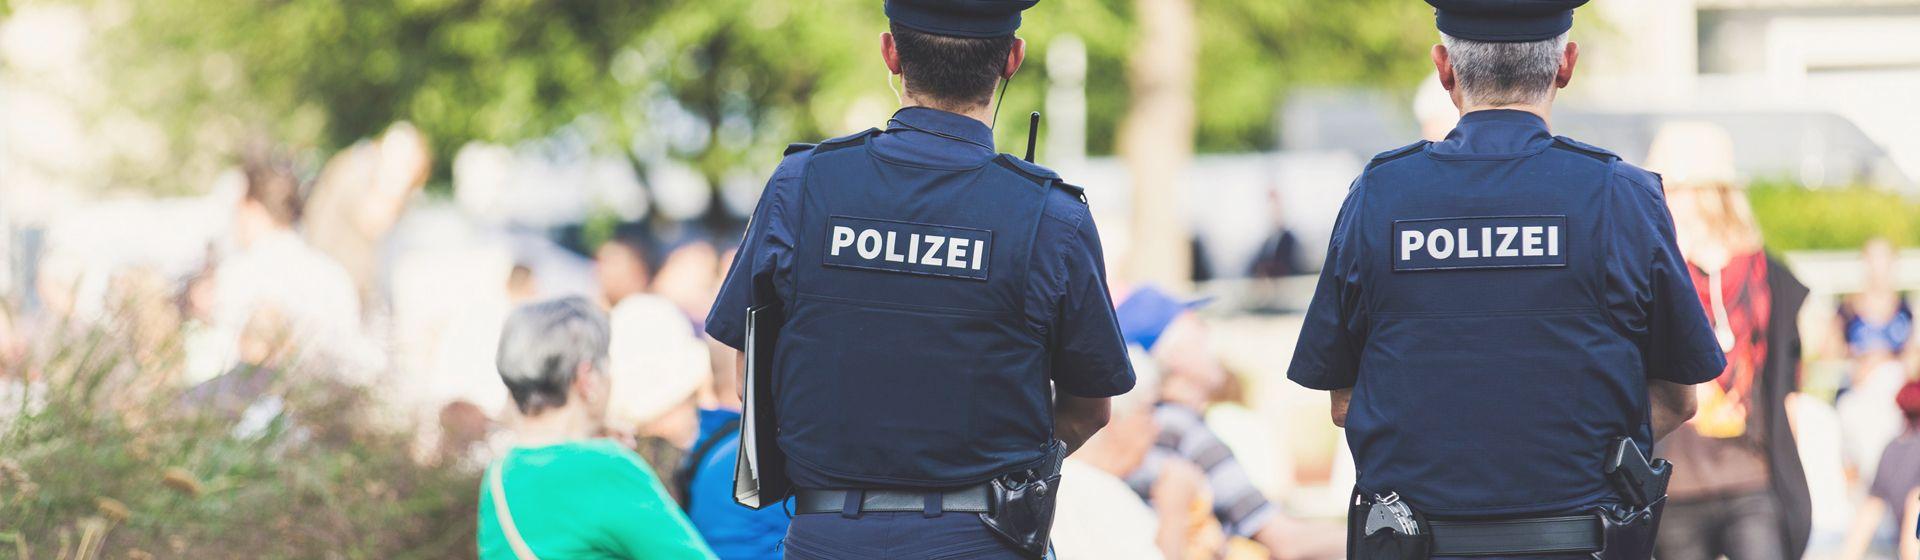 Polizei Corona